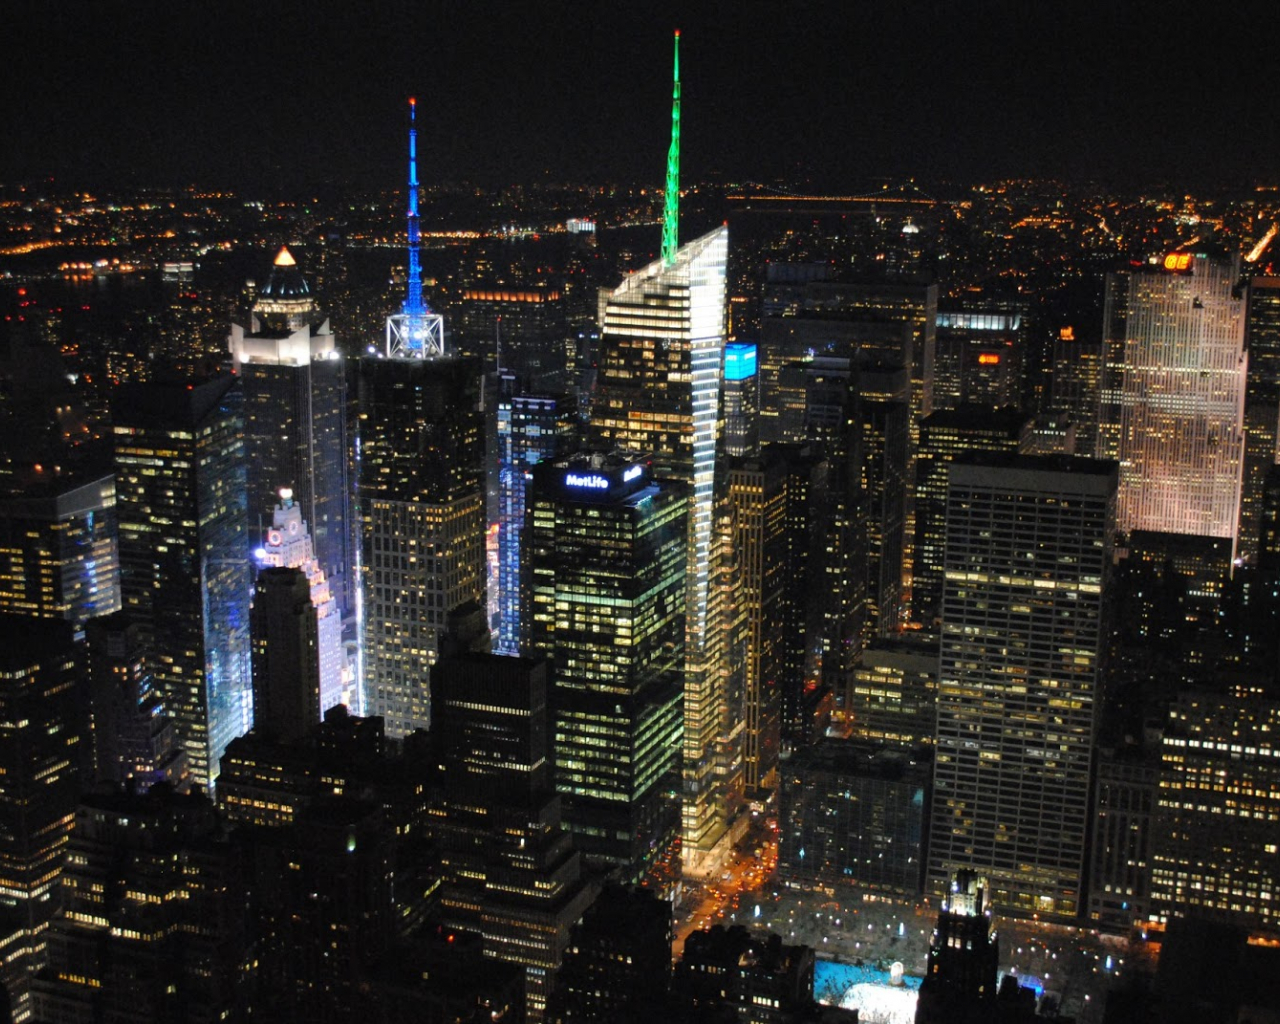 Free Download New York City Hd Desktop Wallpaper 1080p Download Fine Hd 1600x1071 For Your Desktop Mobile Tablet Explore 69 New York City Wallpaper Hd Pictures New York City